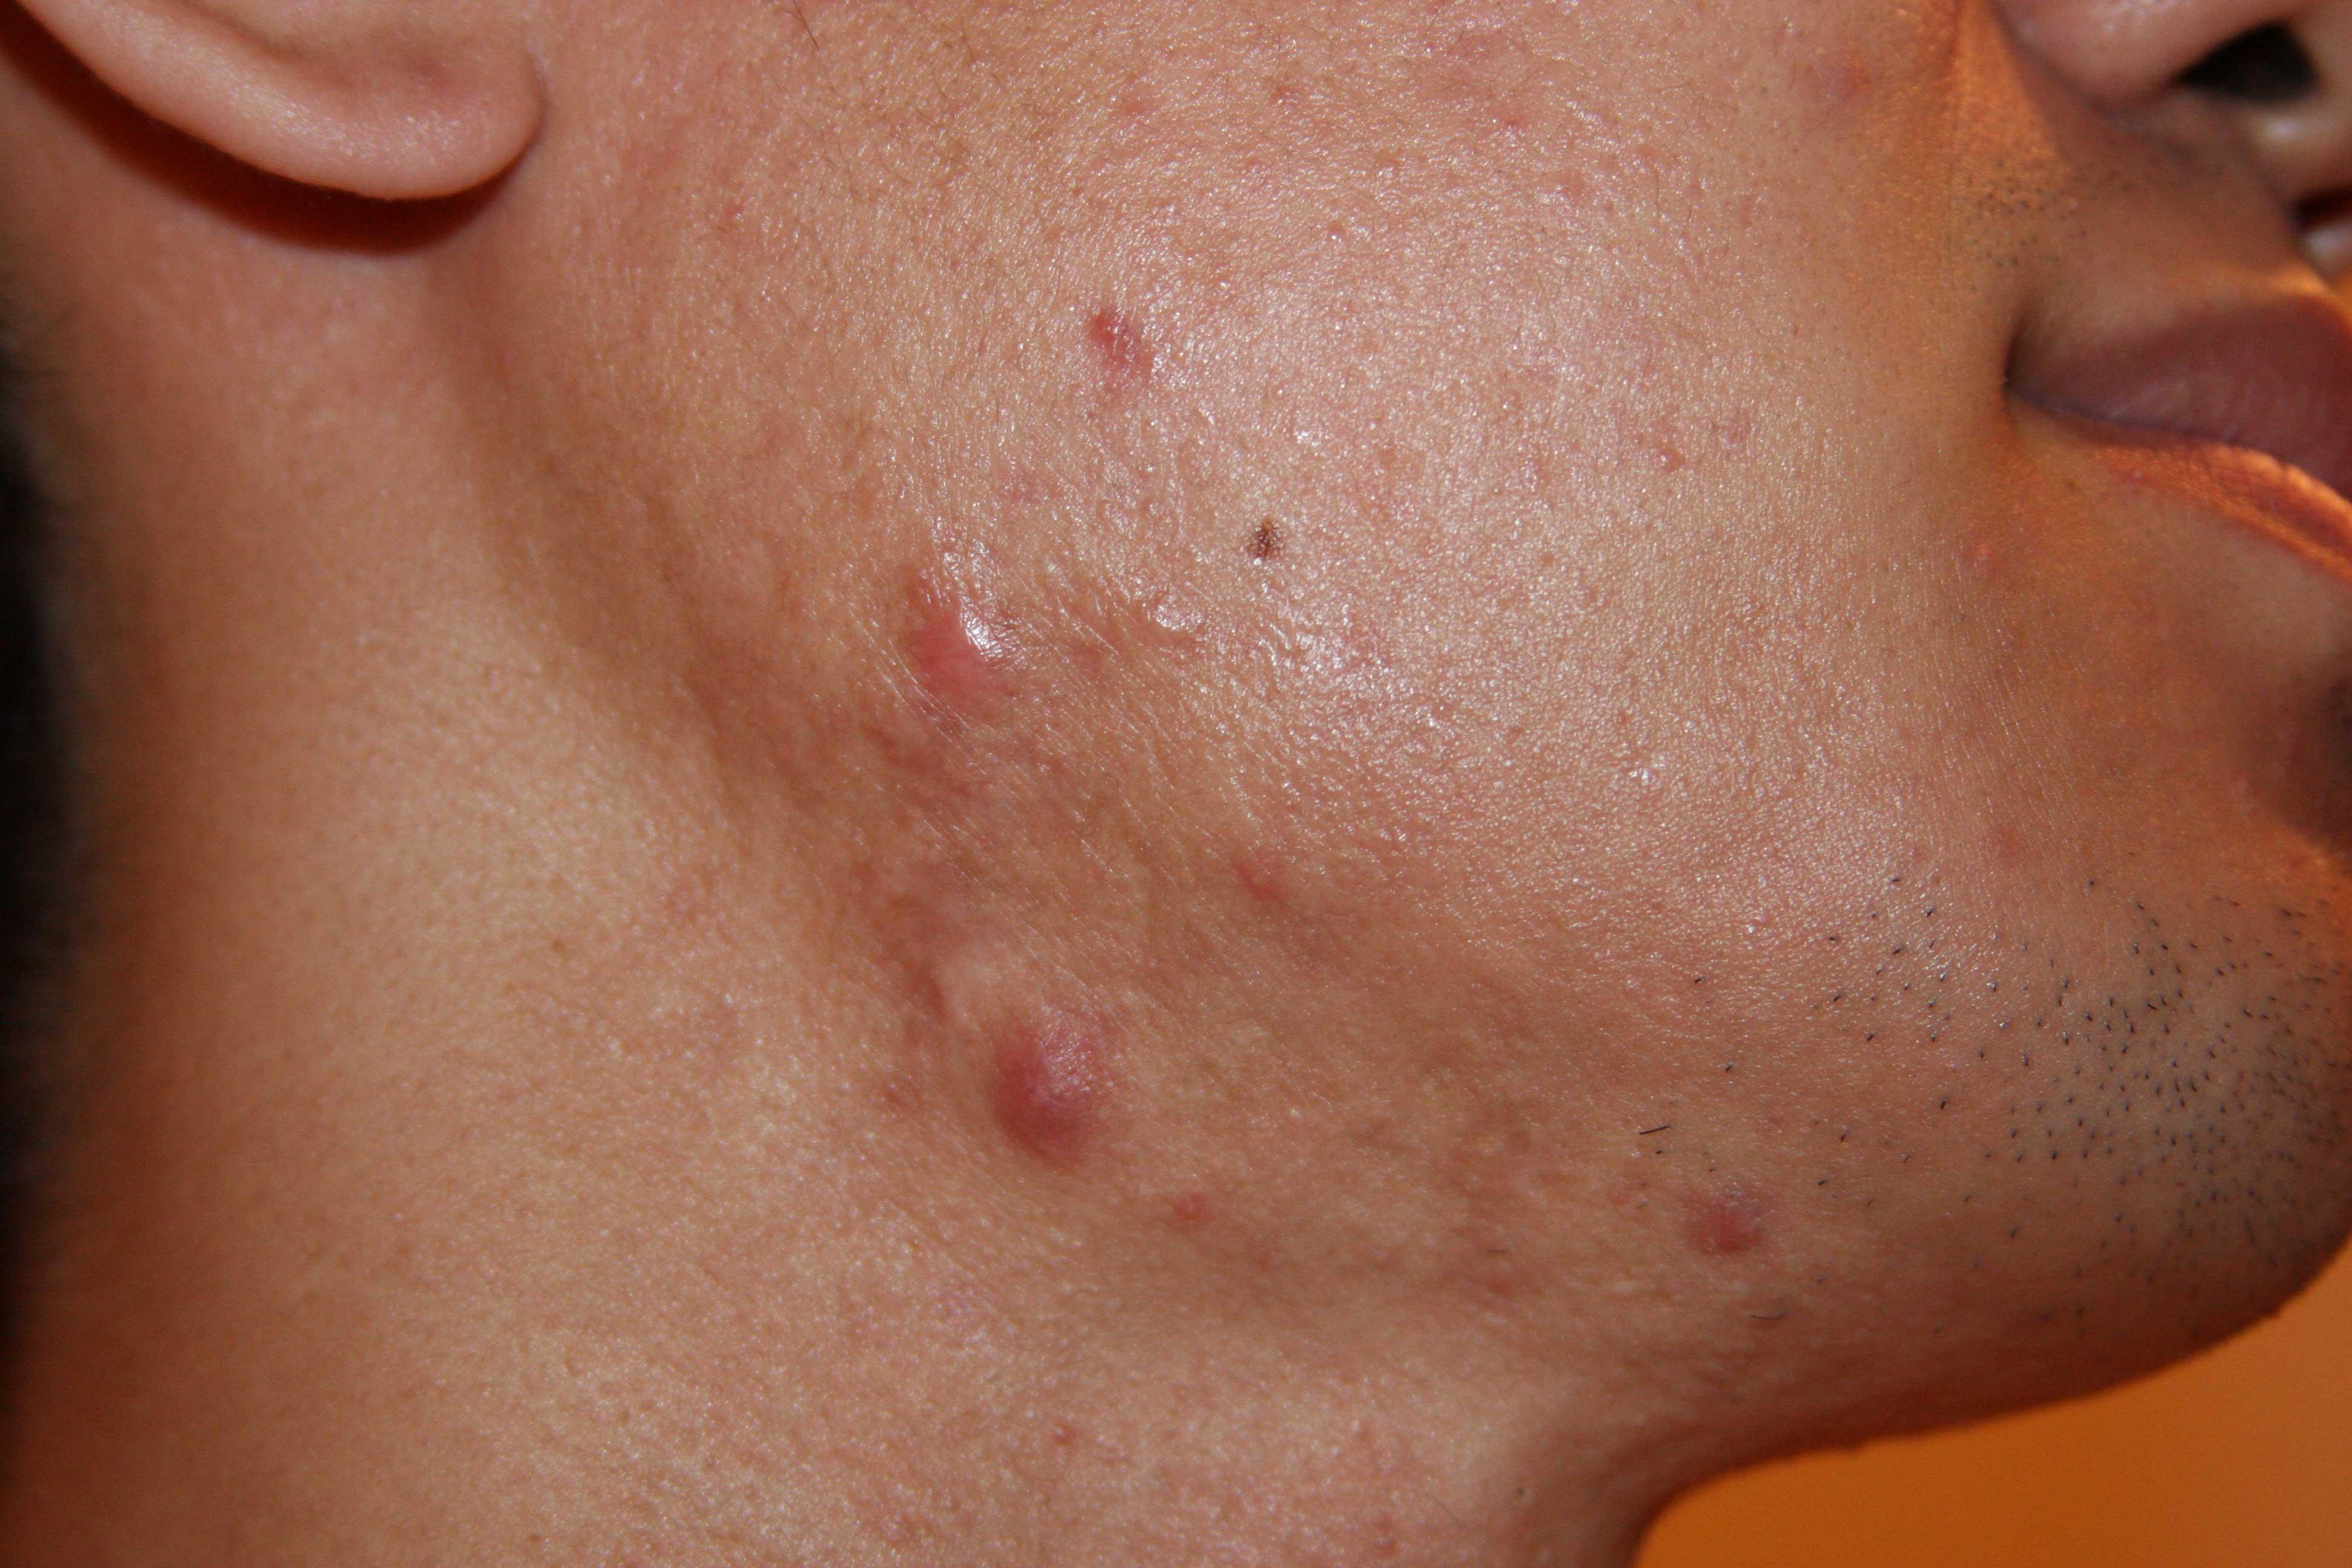 Facial keloid in white skin individual